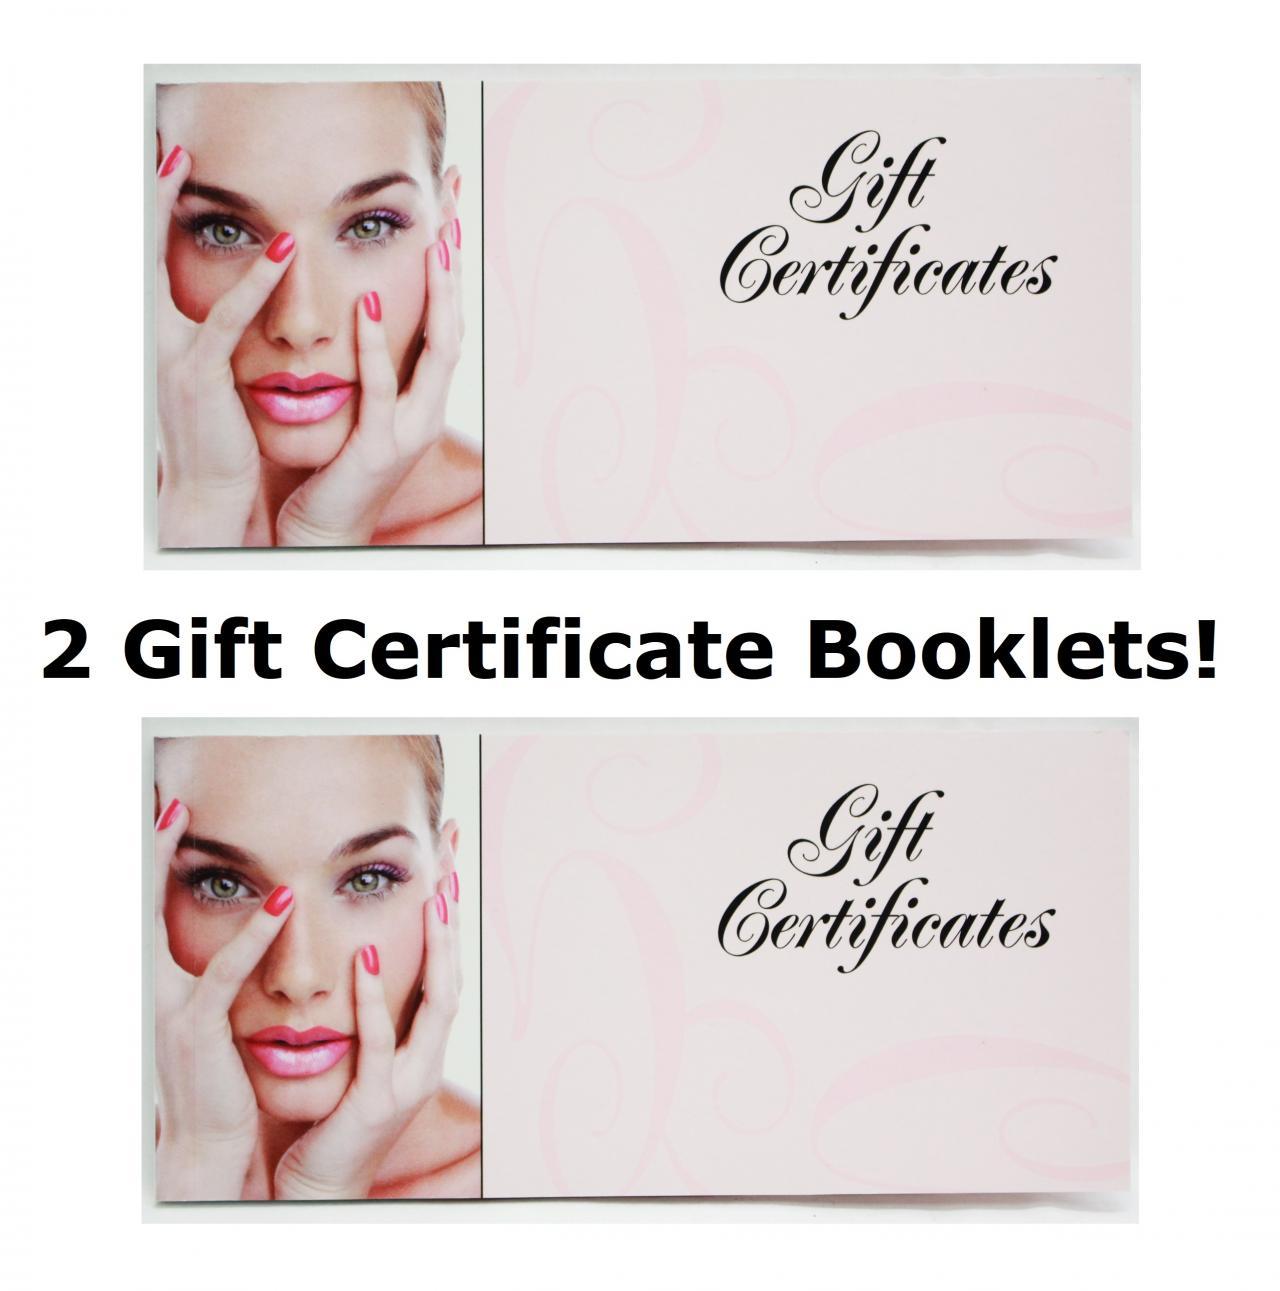 tearable blank gift certificate book spa hair nail beauty salon 50ct